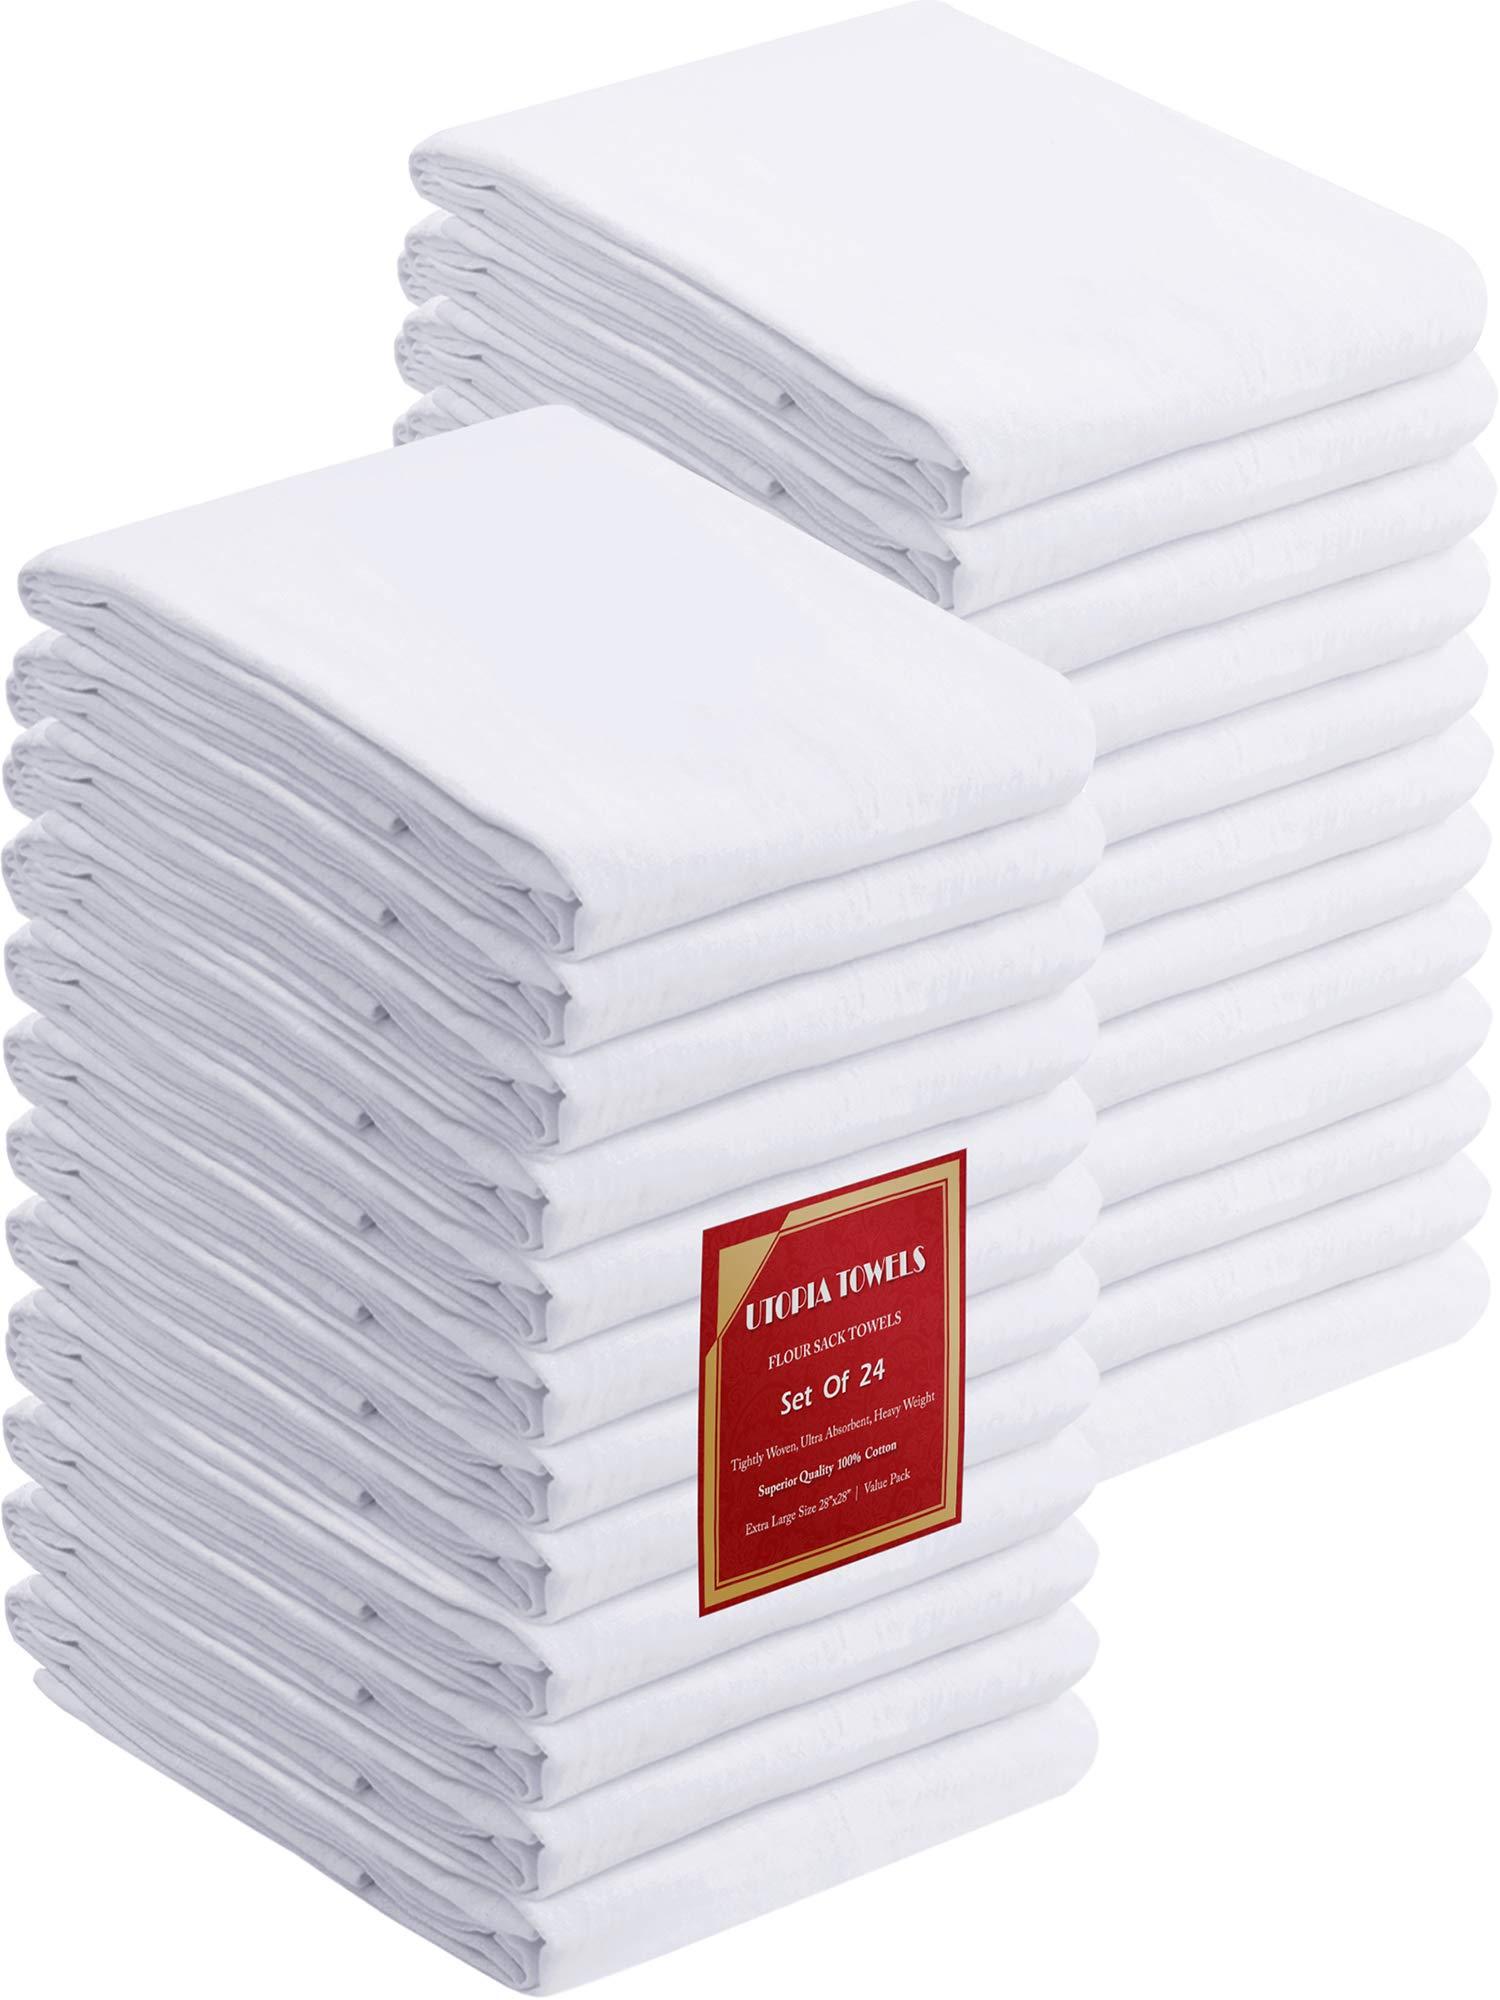 Utopia Kitchen Flour Sack Dish Towels, 24 Pack Cotton Kitchen Towels